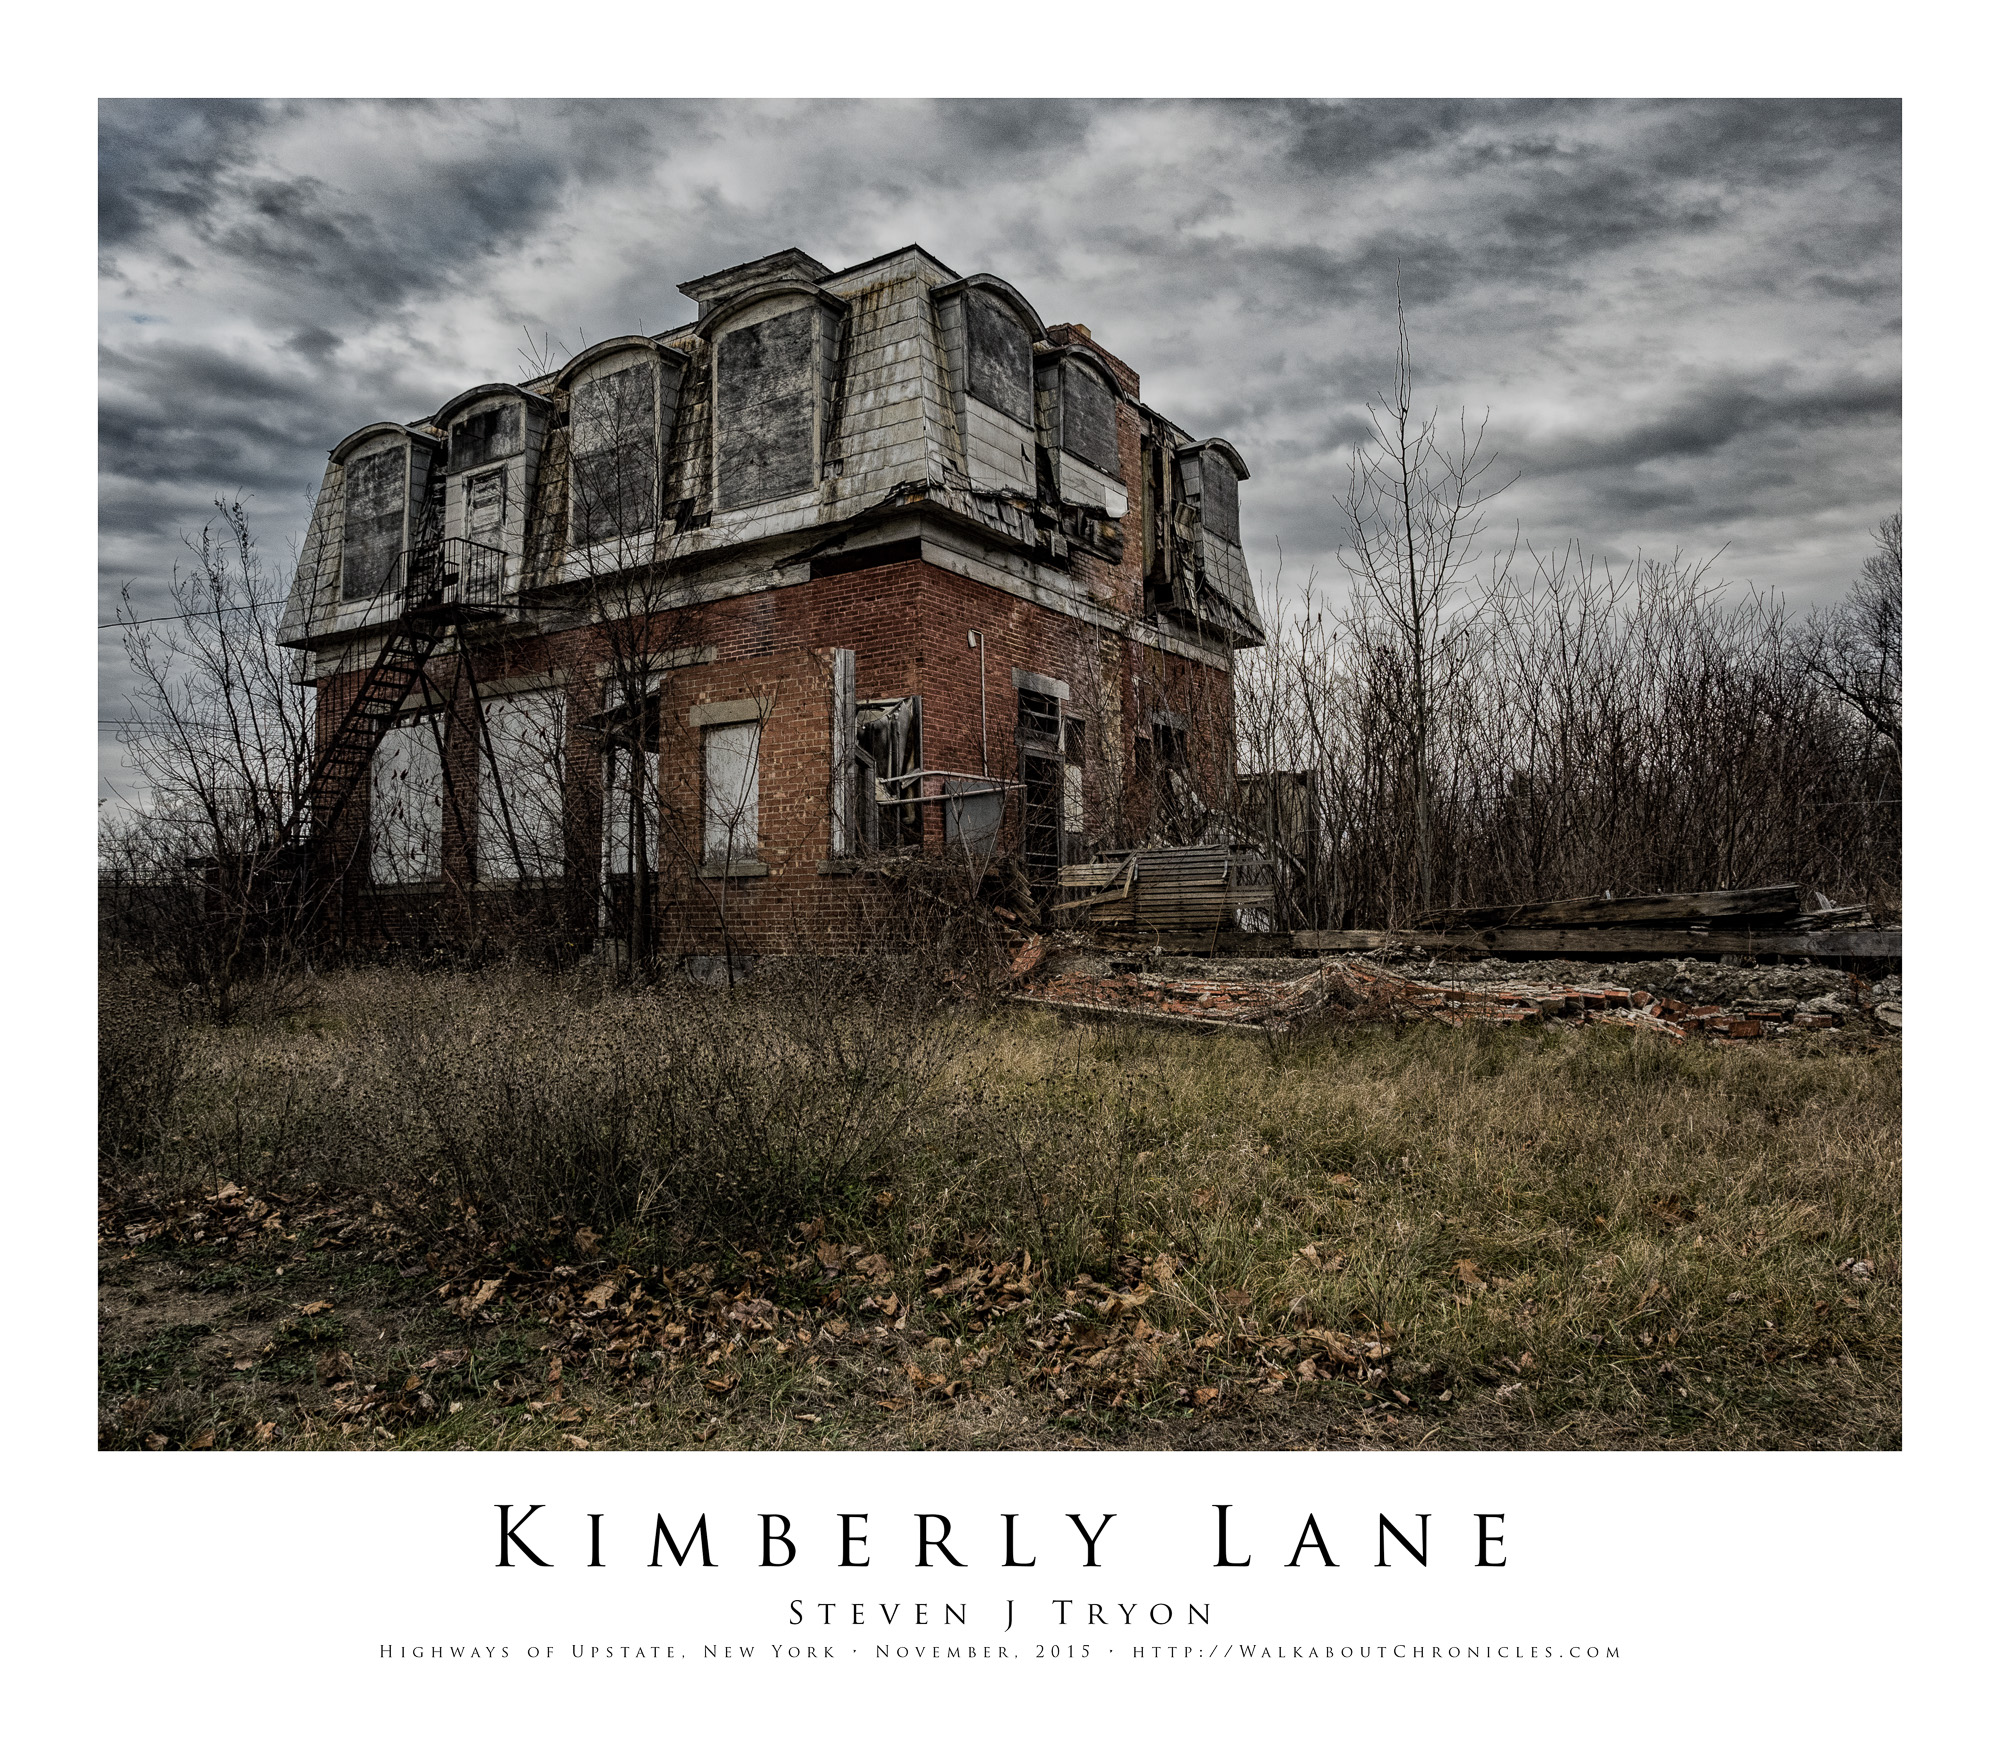 Kimberly Lane